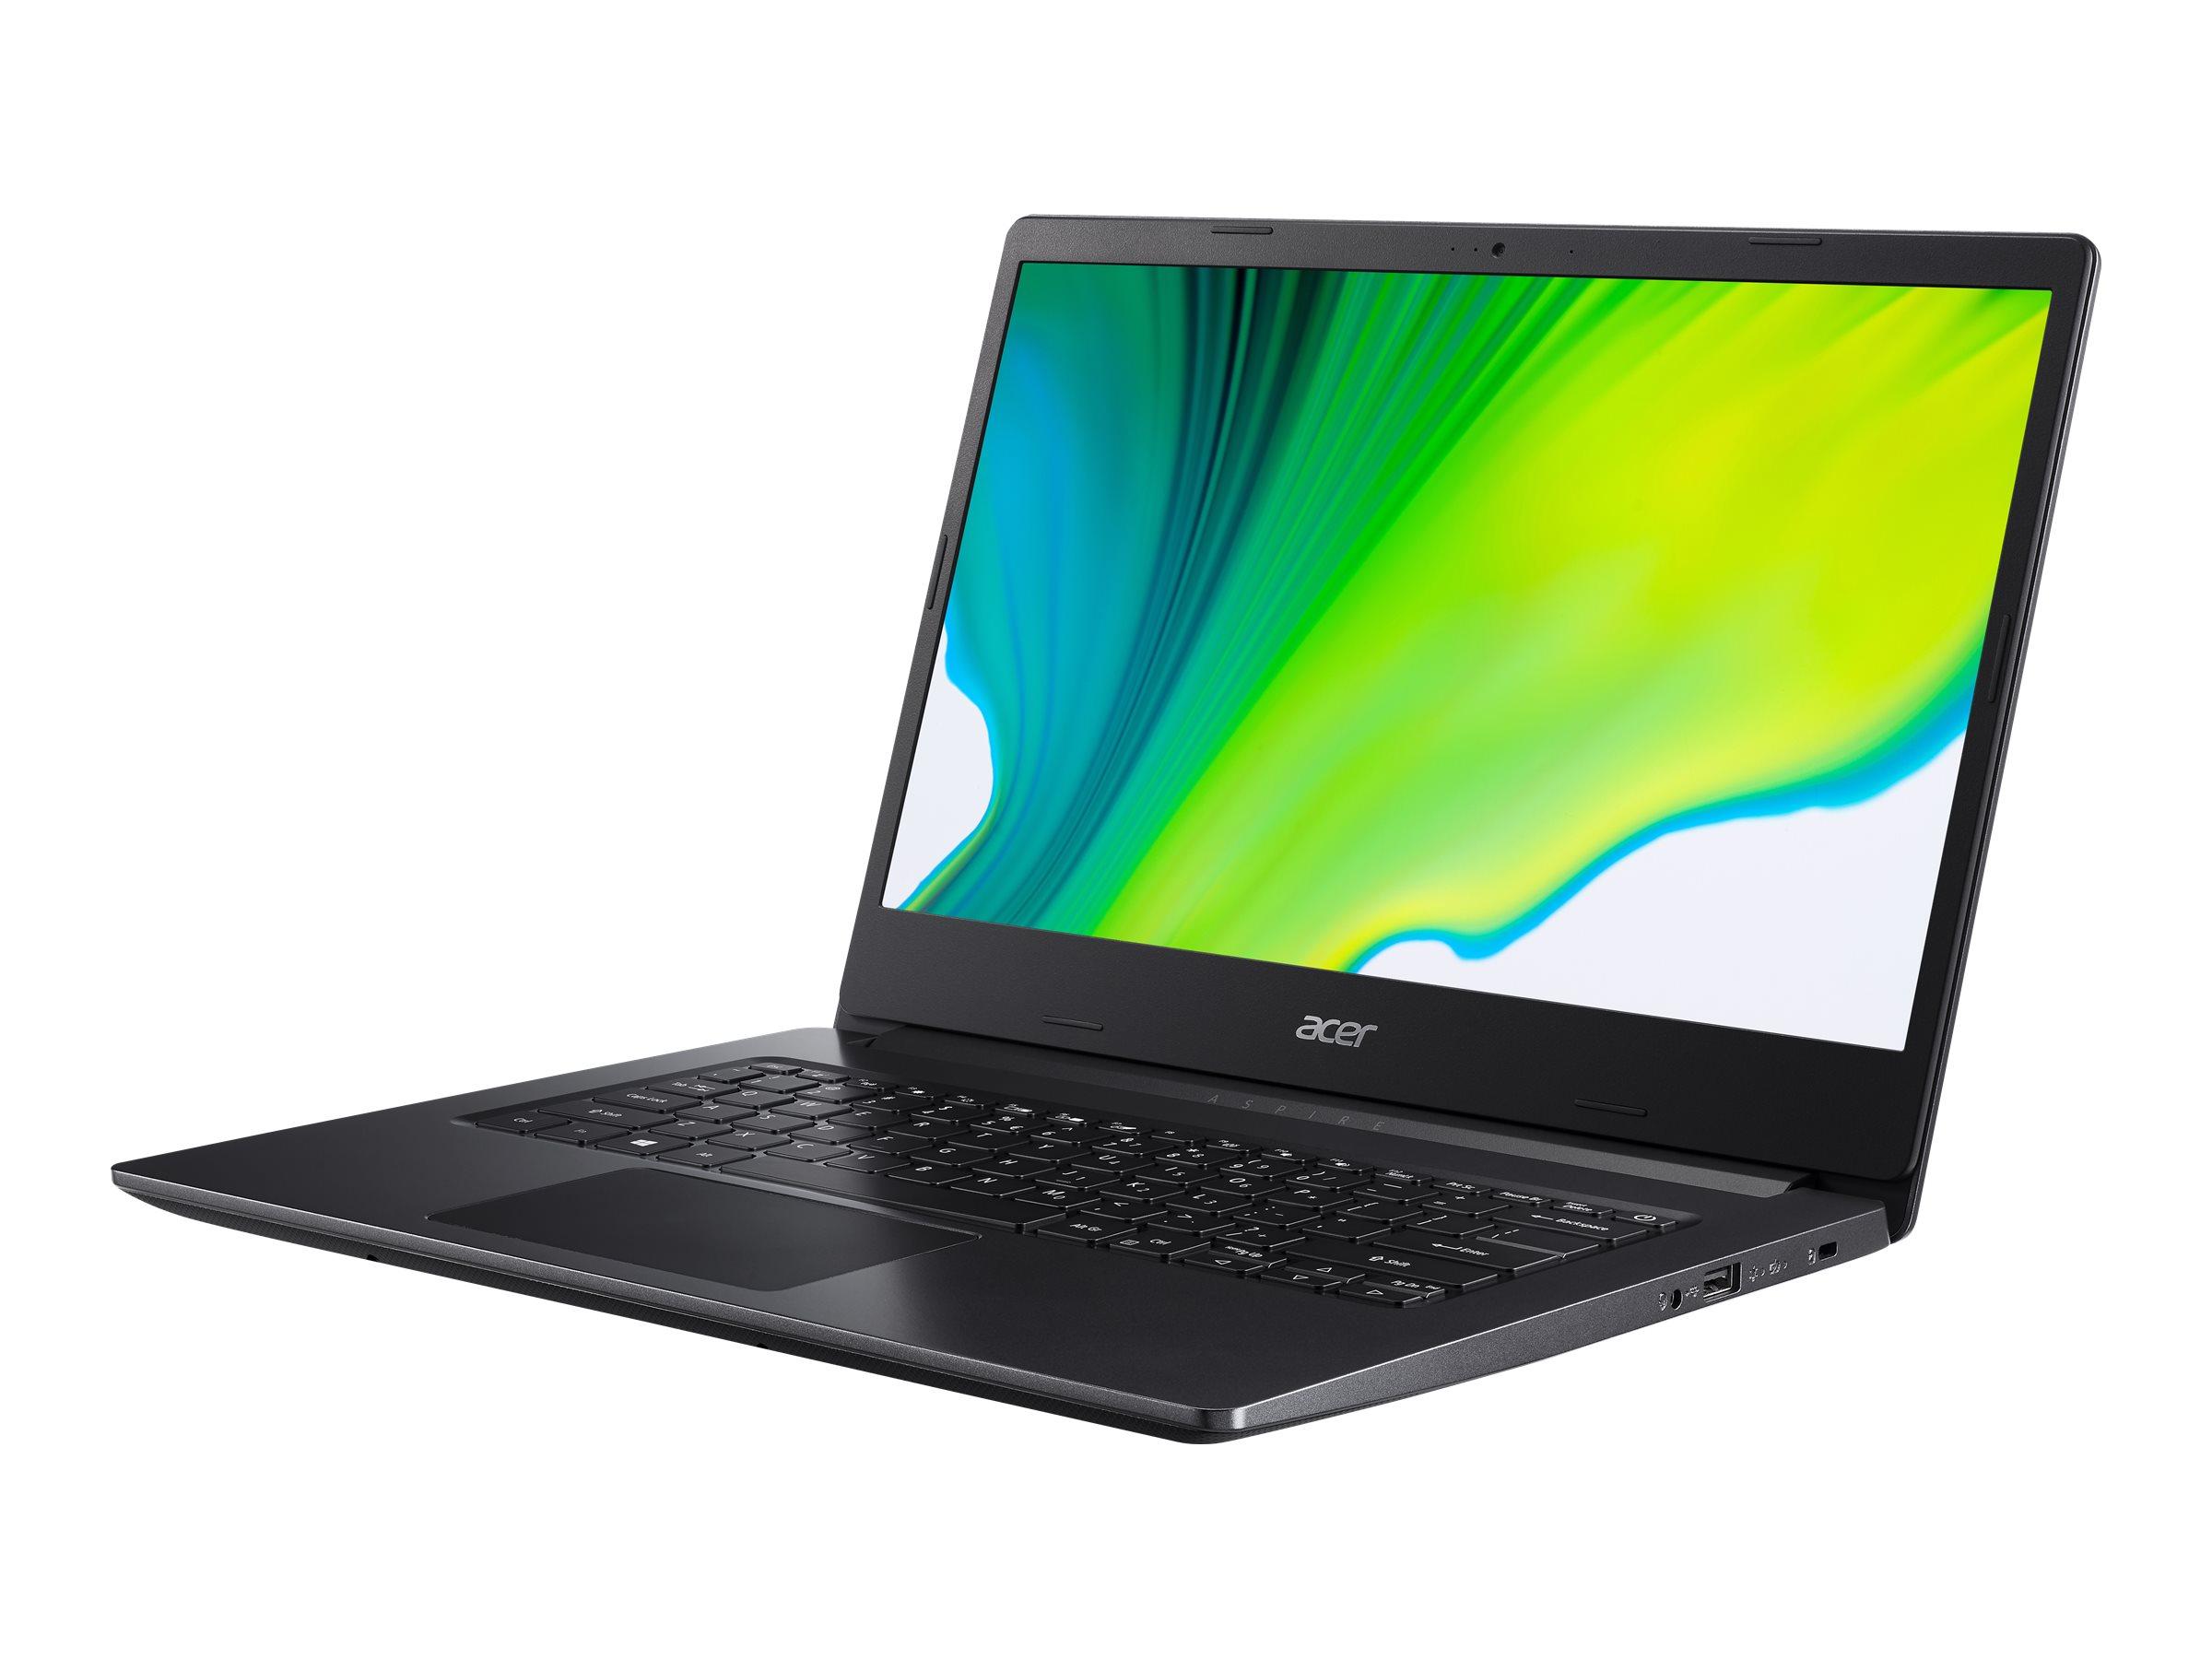 Acer Aspire 3 A314-22-R4SA - Ryzen 5 3500U / 2.1 GHz - Win 10 Home 64-Bit - 8 GB RAM - 512 GB SSD - 35.6 cm (14